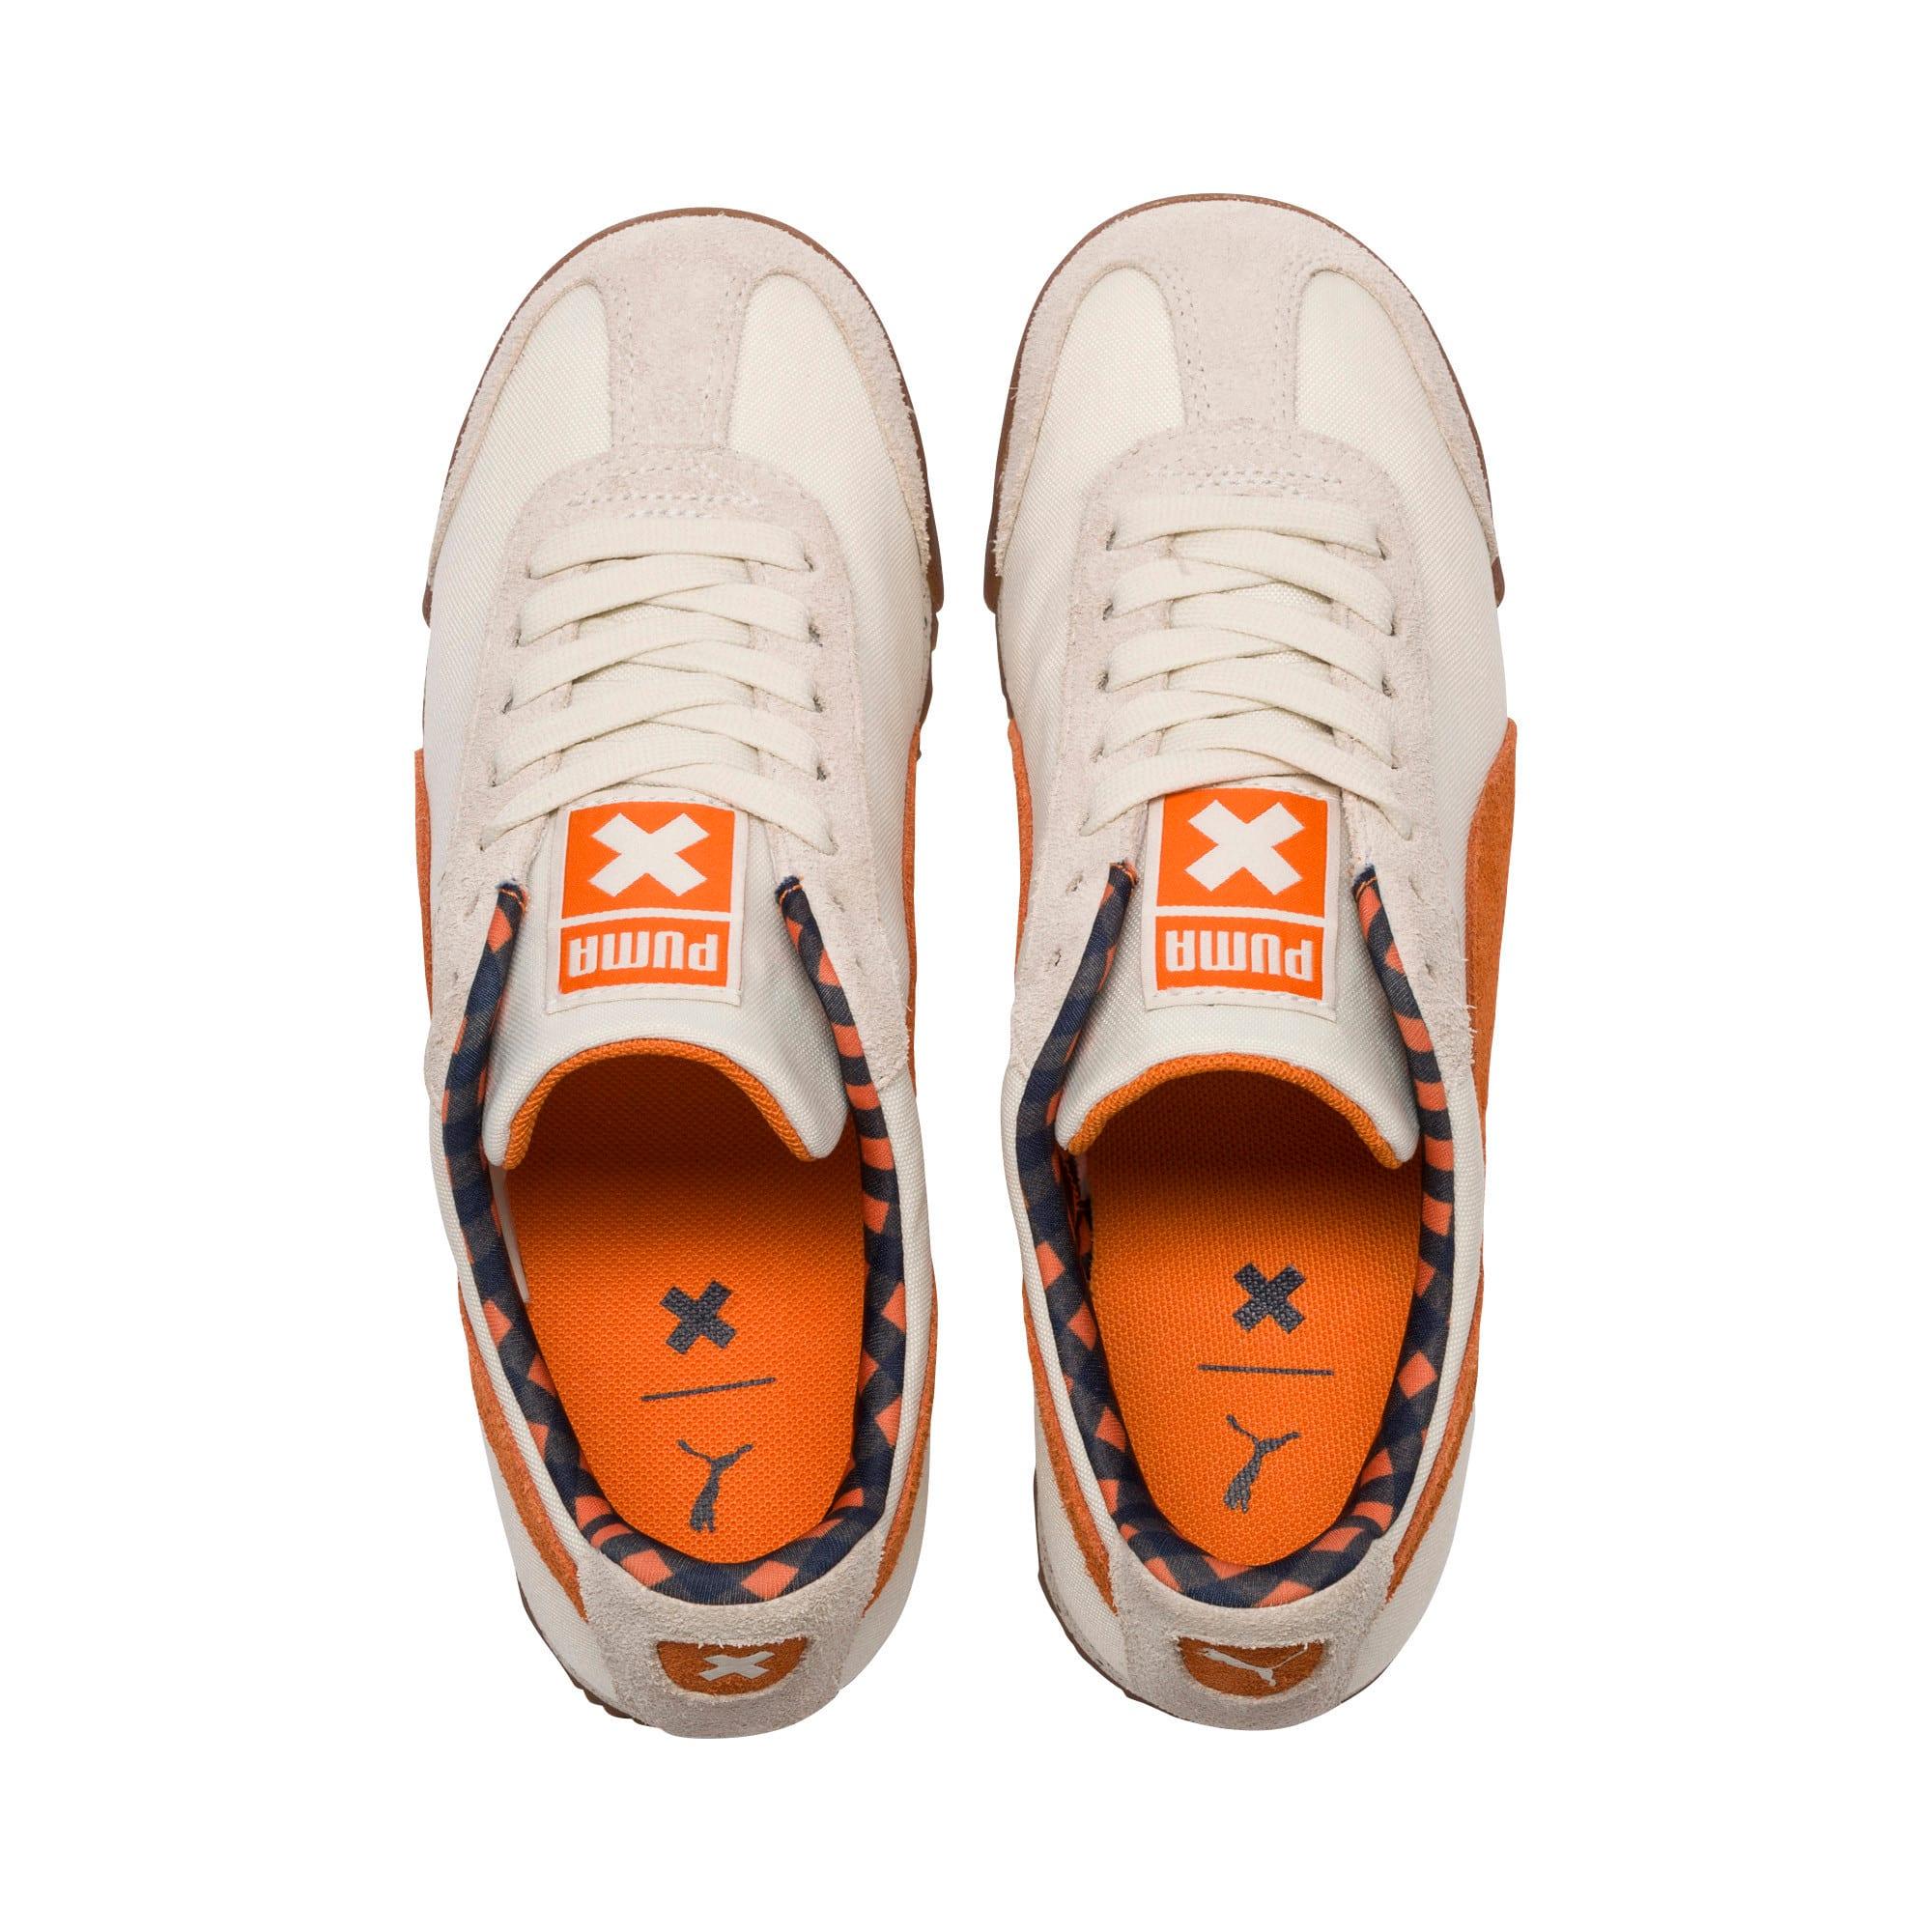 Thumbnail 6 of PUMA X TINYCOTTONS Roma Sneakers JR, White Asparagus-Orange-Blue, medium